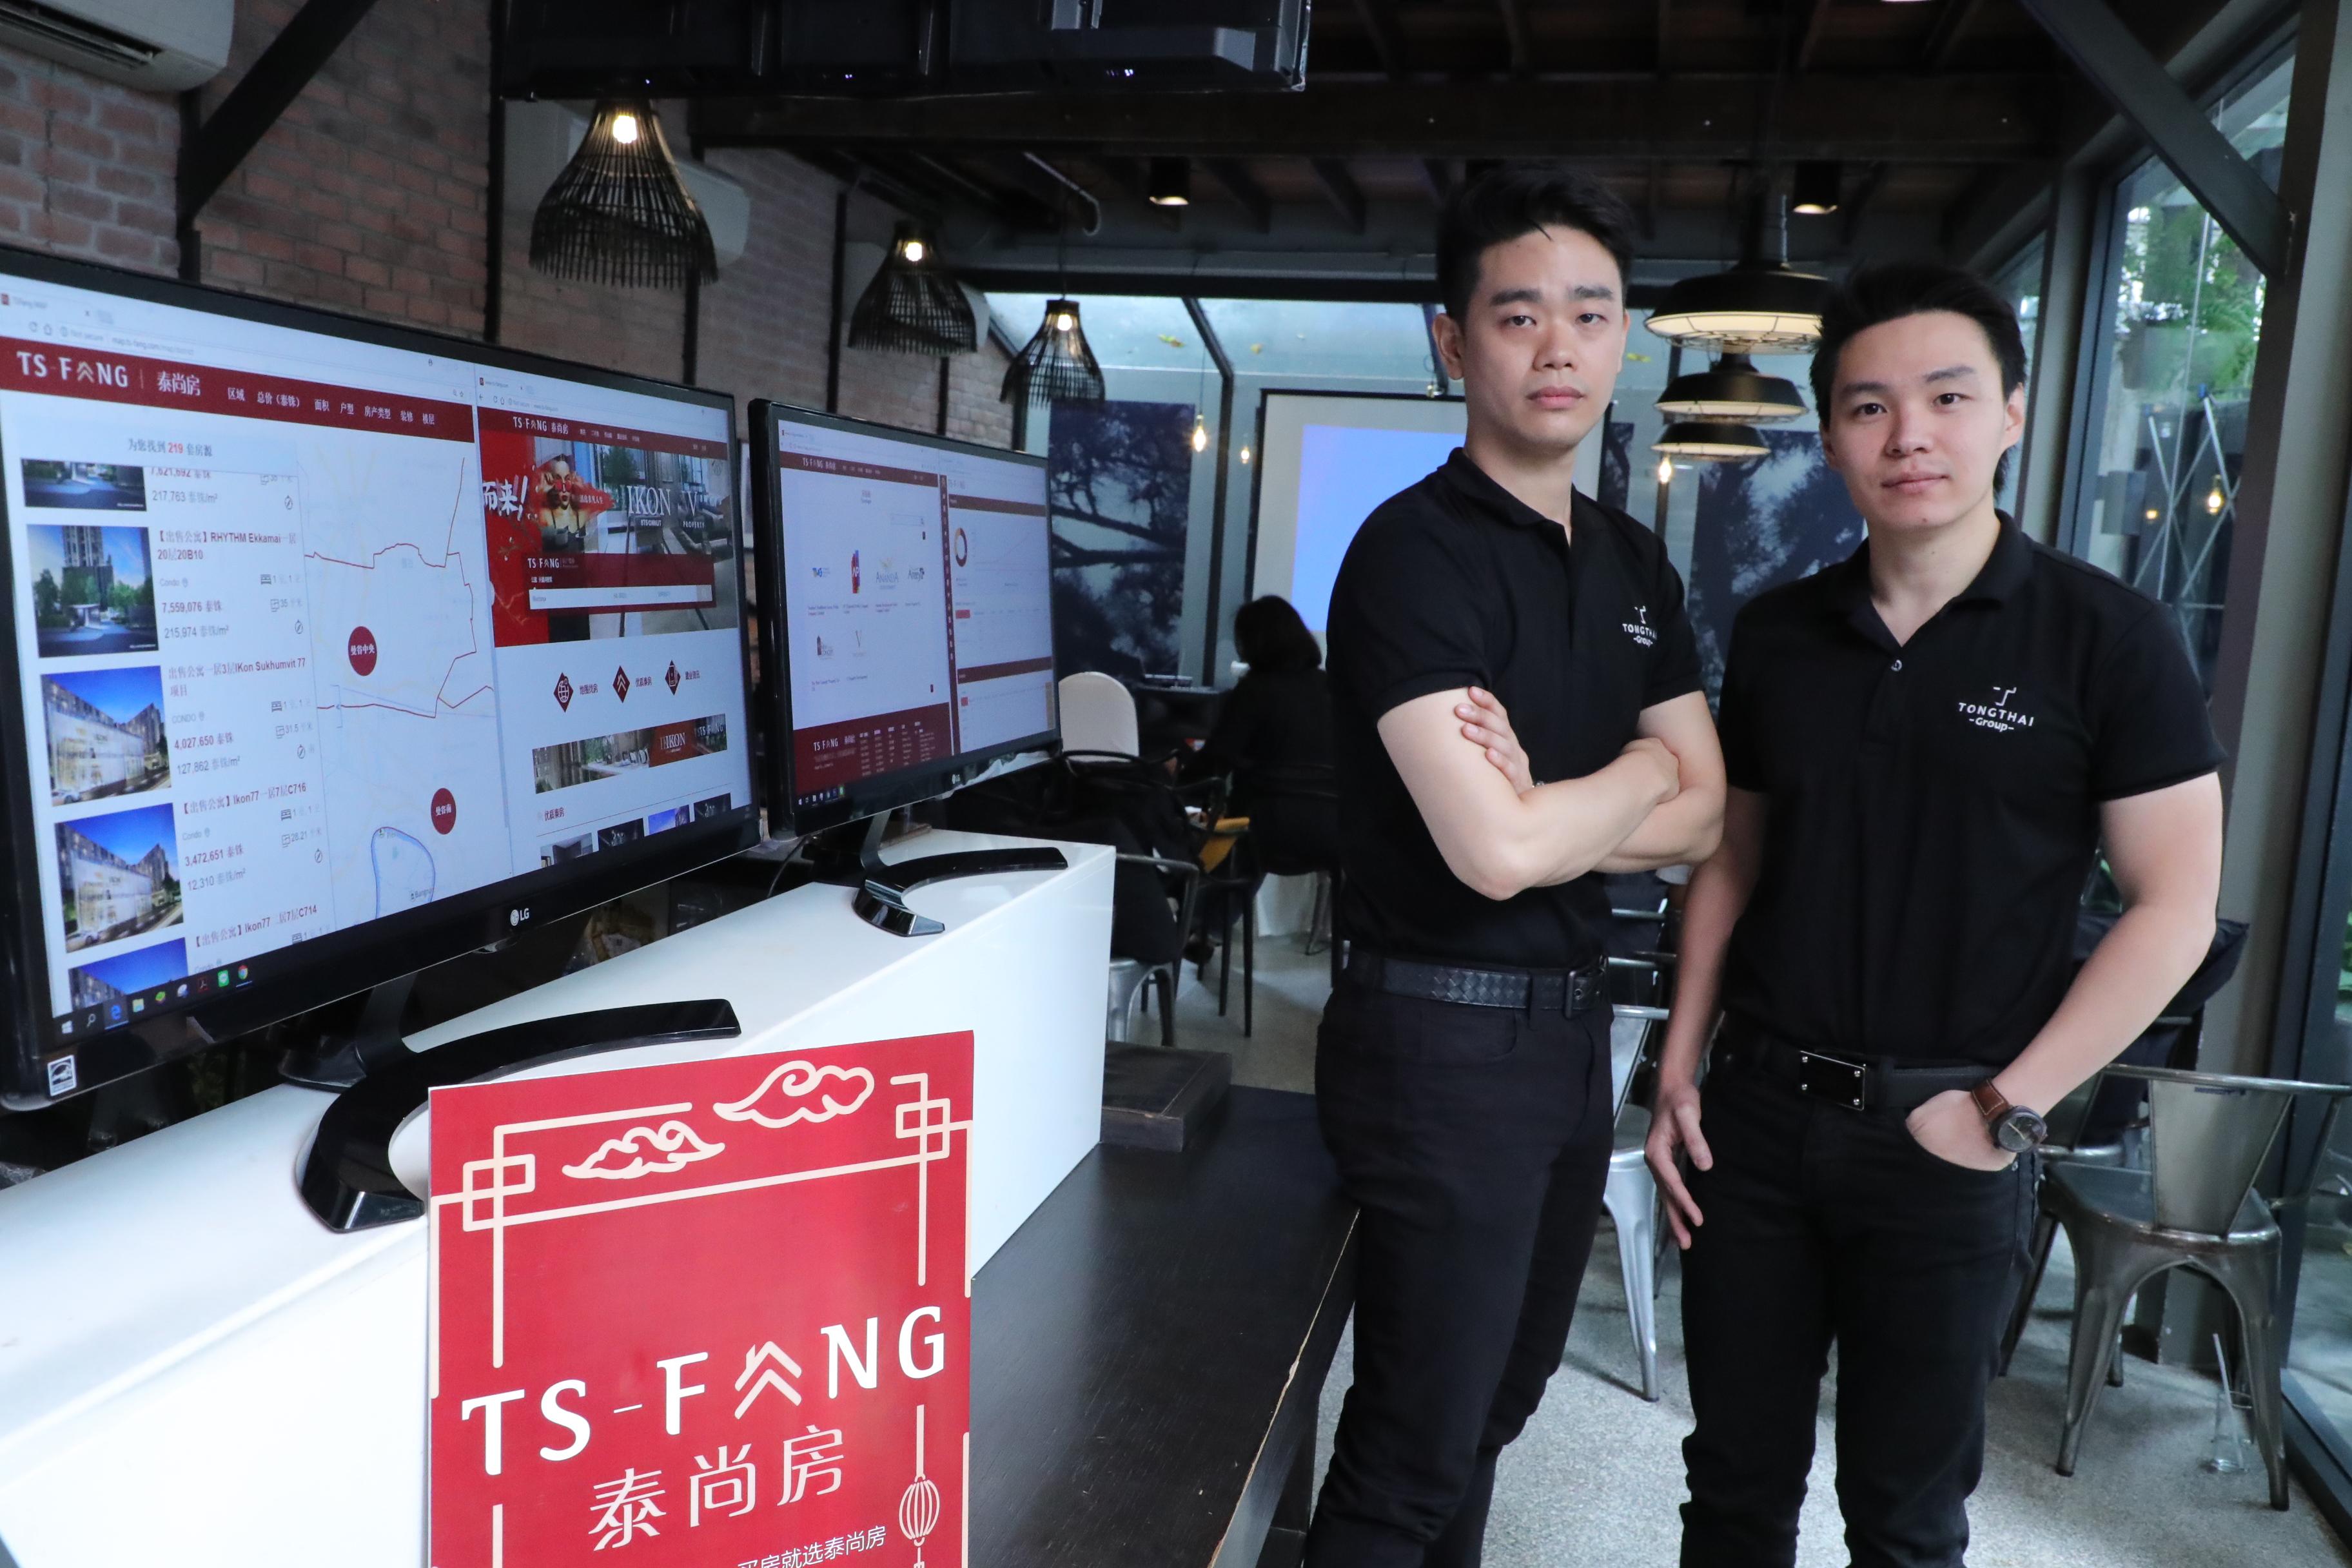 www.ts-fang.com